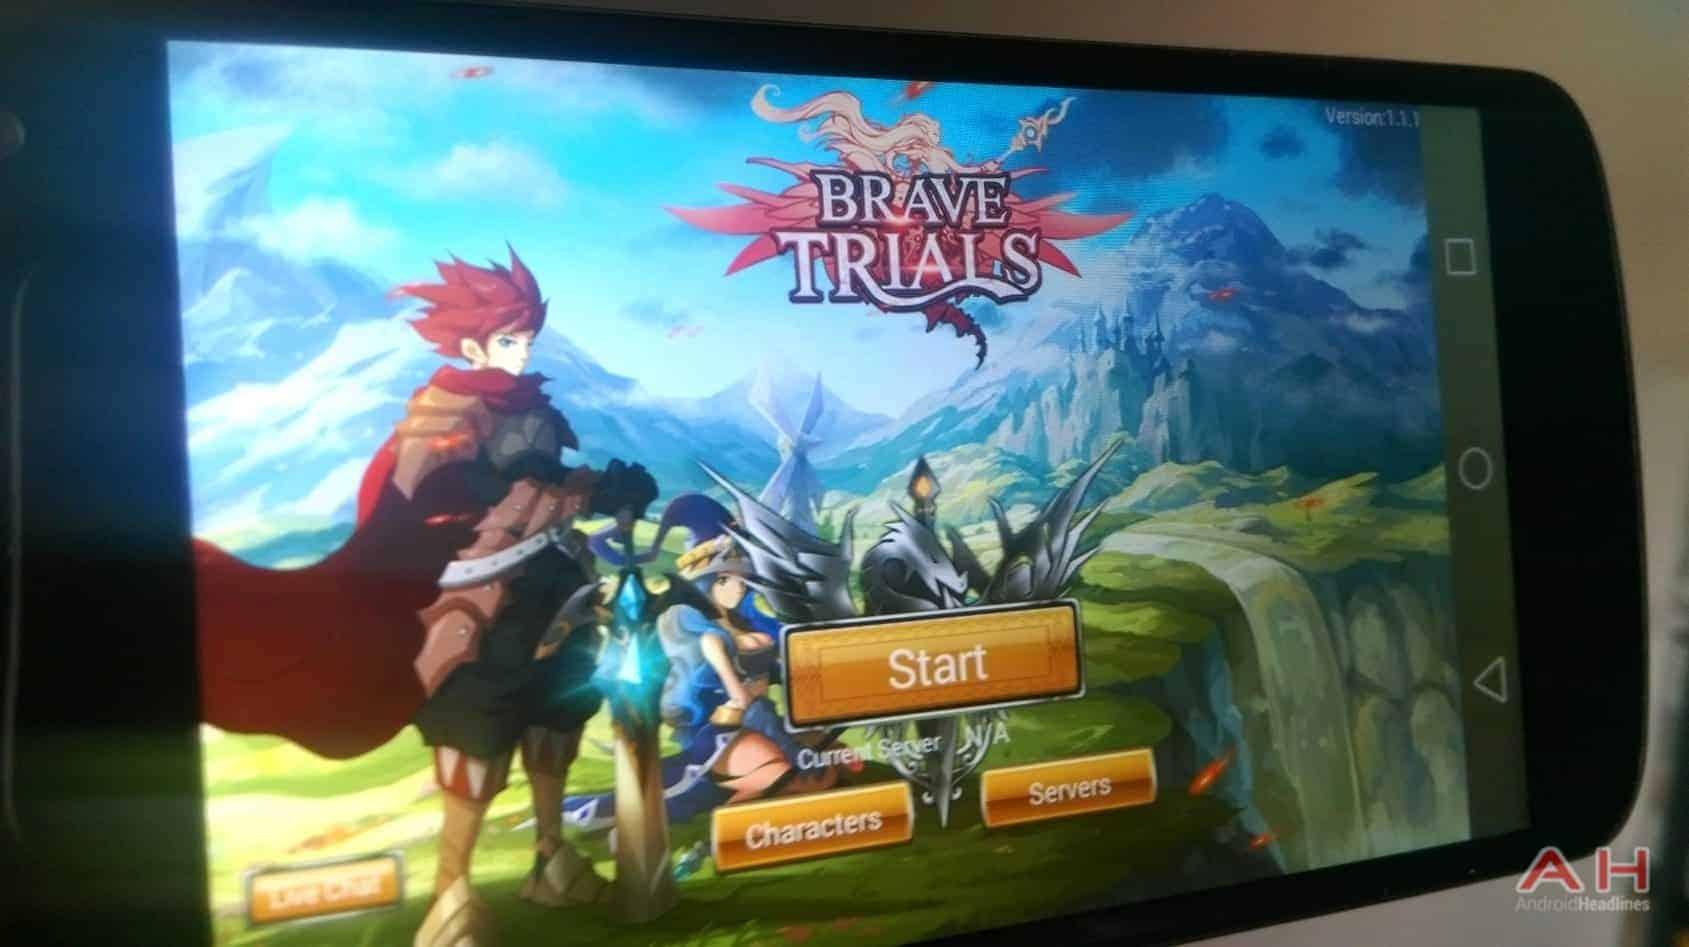 AH Brave Trials